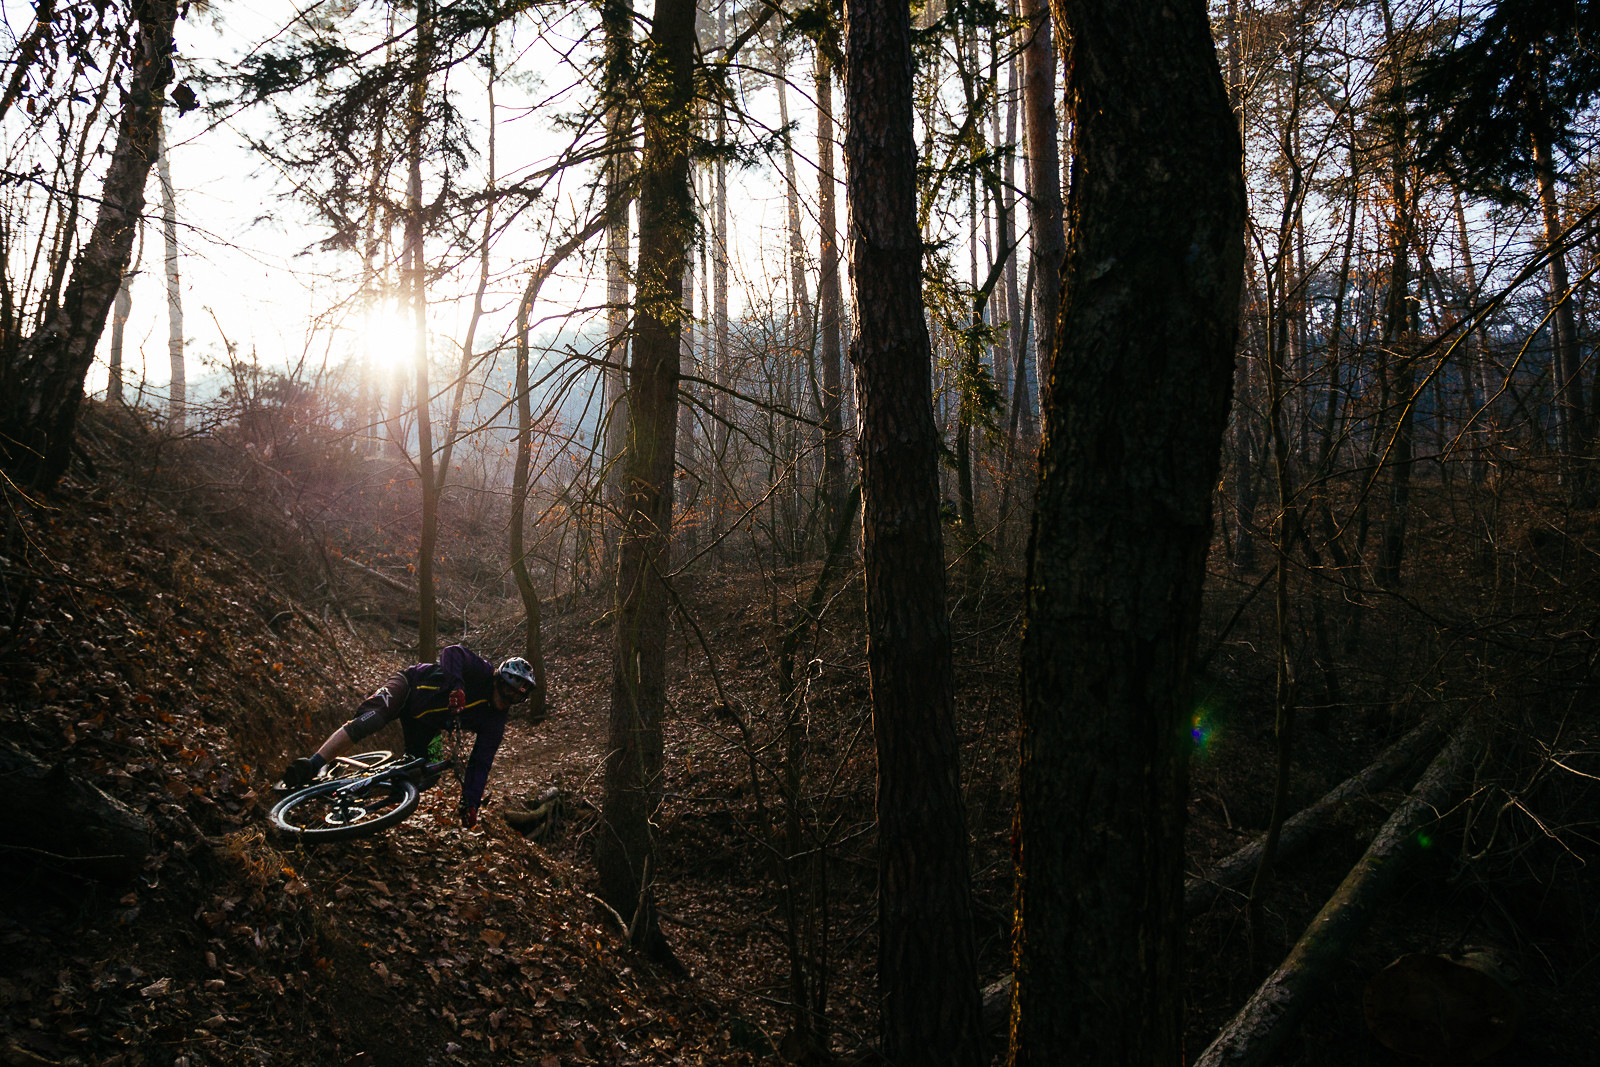 Gary - EWIA - Mountain Biking Pictures - Vital MTB